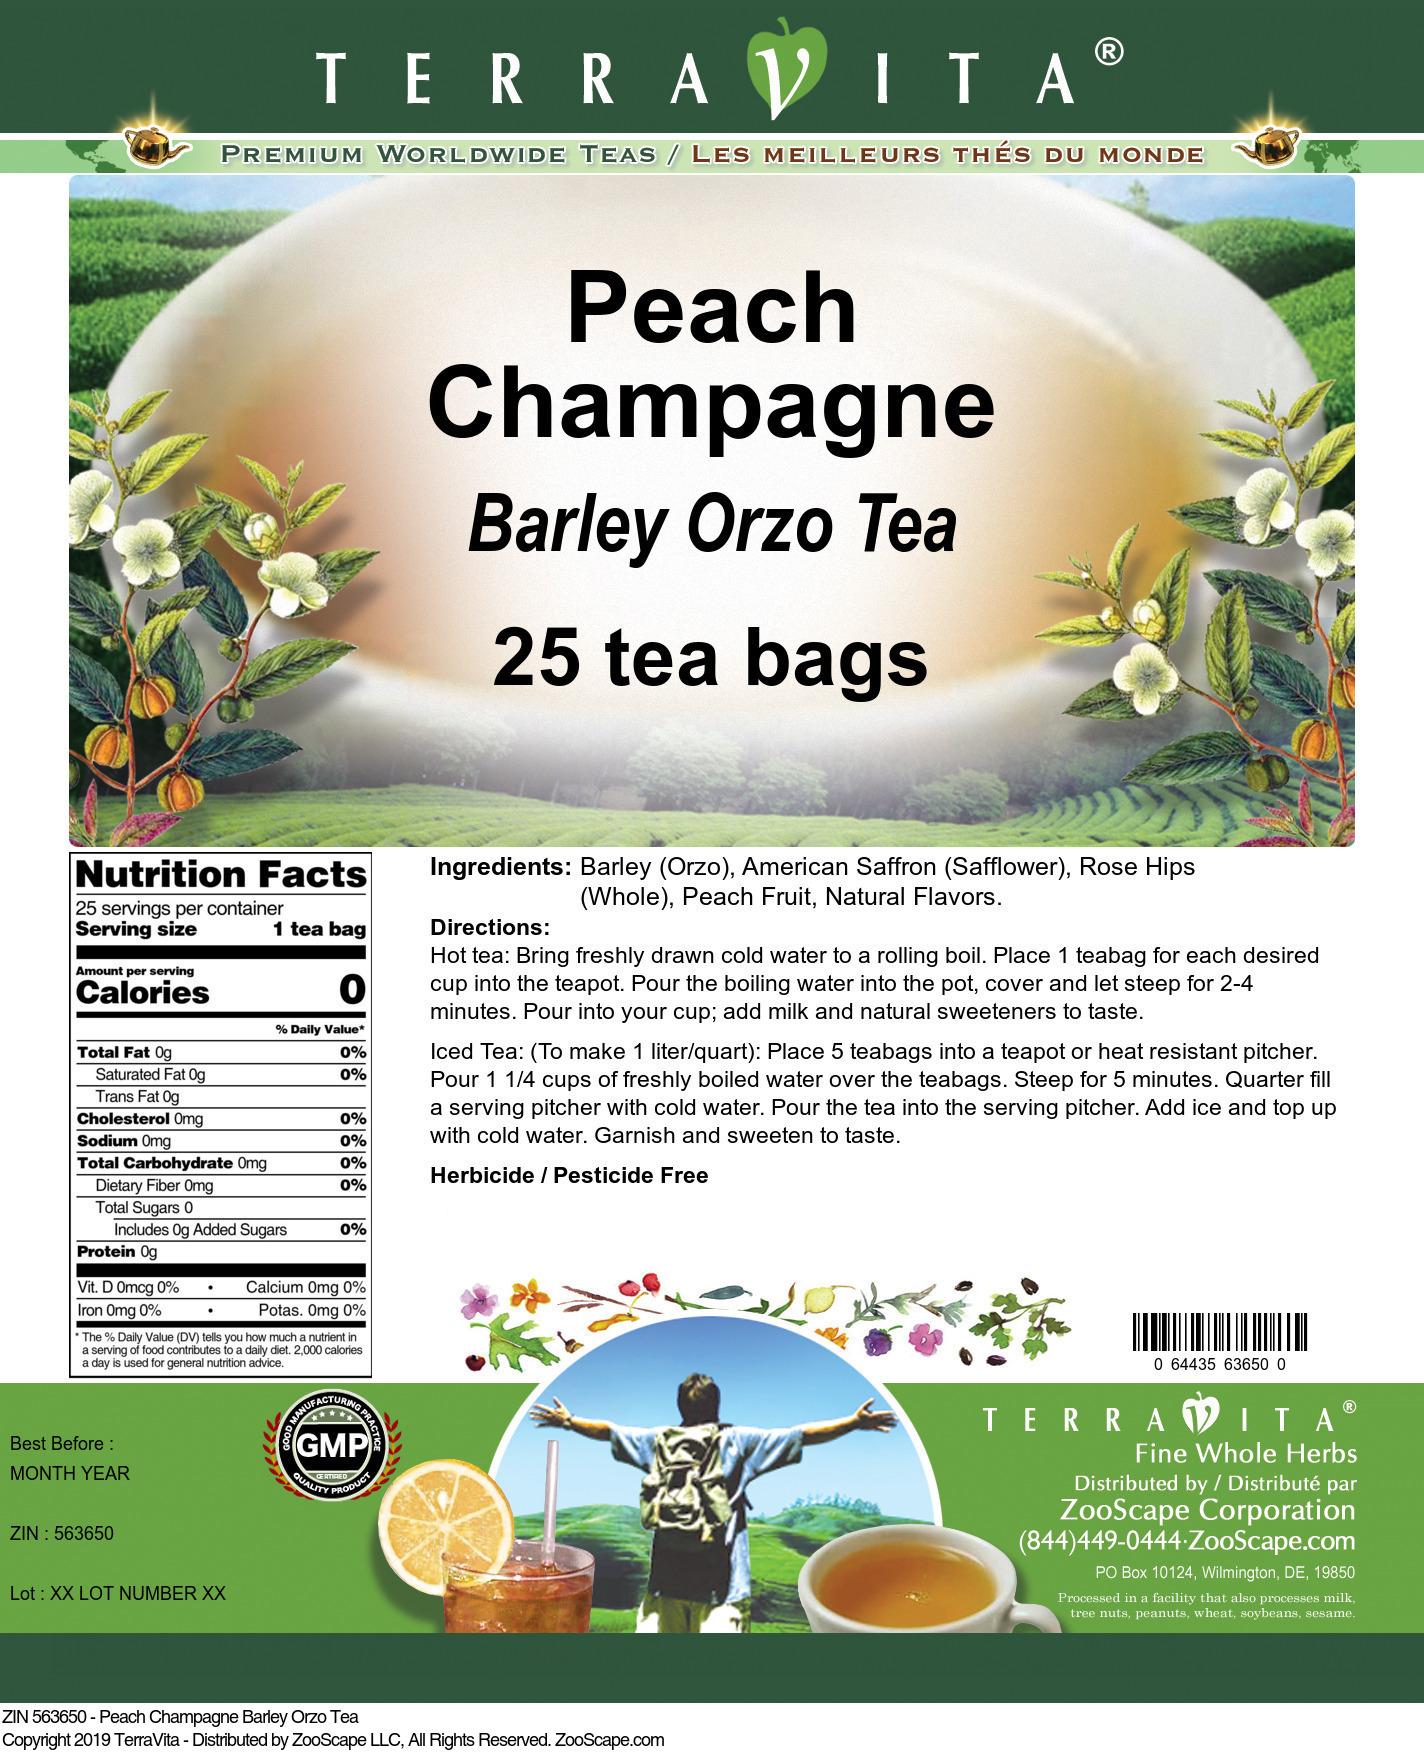 Peach Champagne Barley Orzo